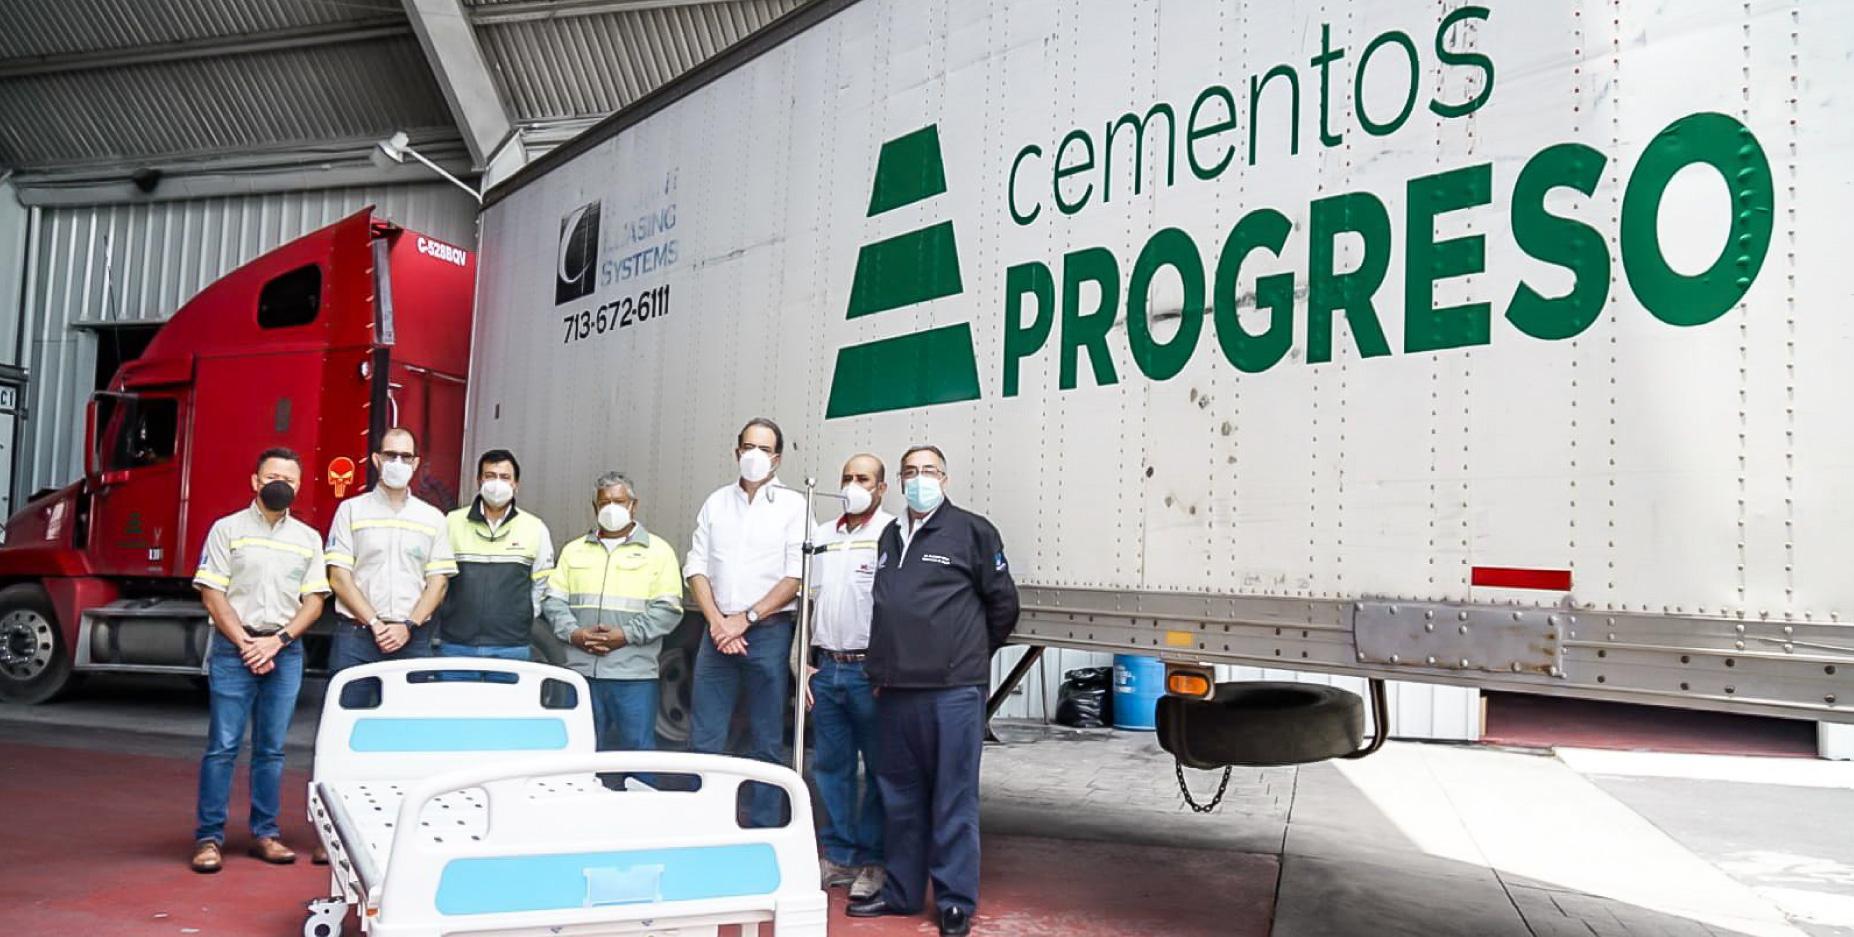 Empresas 100% guatemaltecas donan 150 camas de hospital para atender pacientes positivos de COVID-19